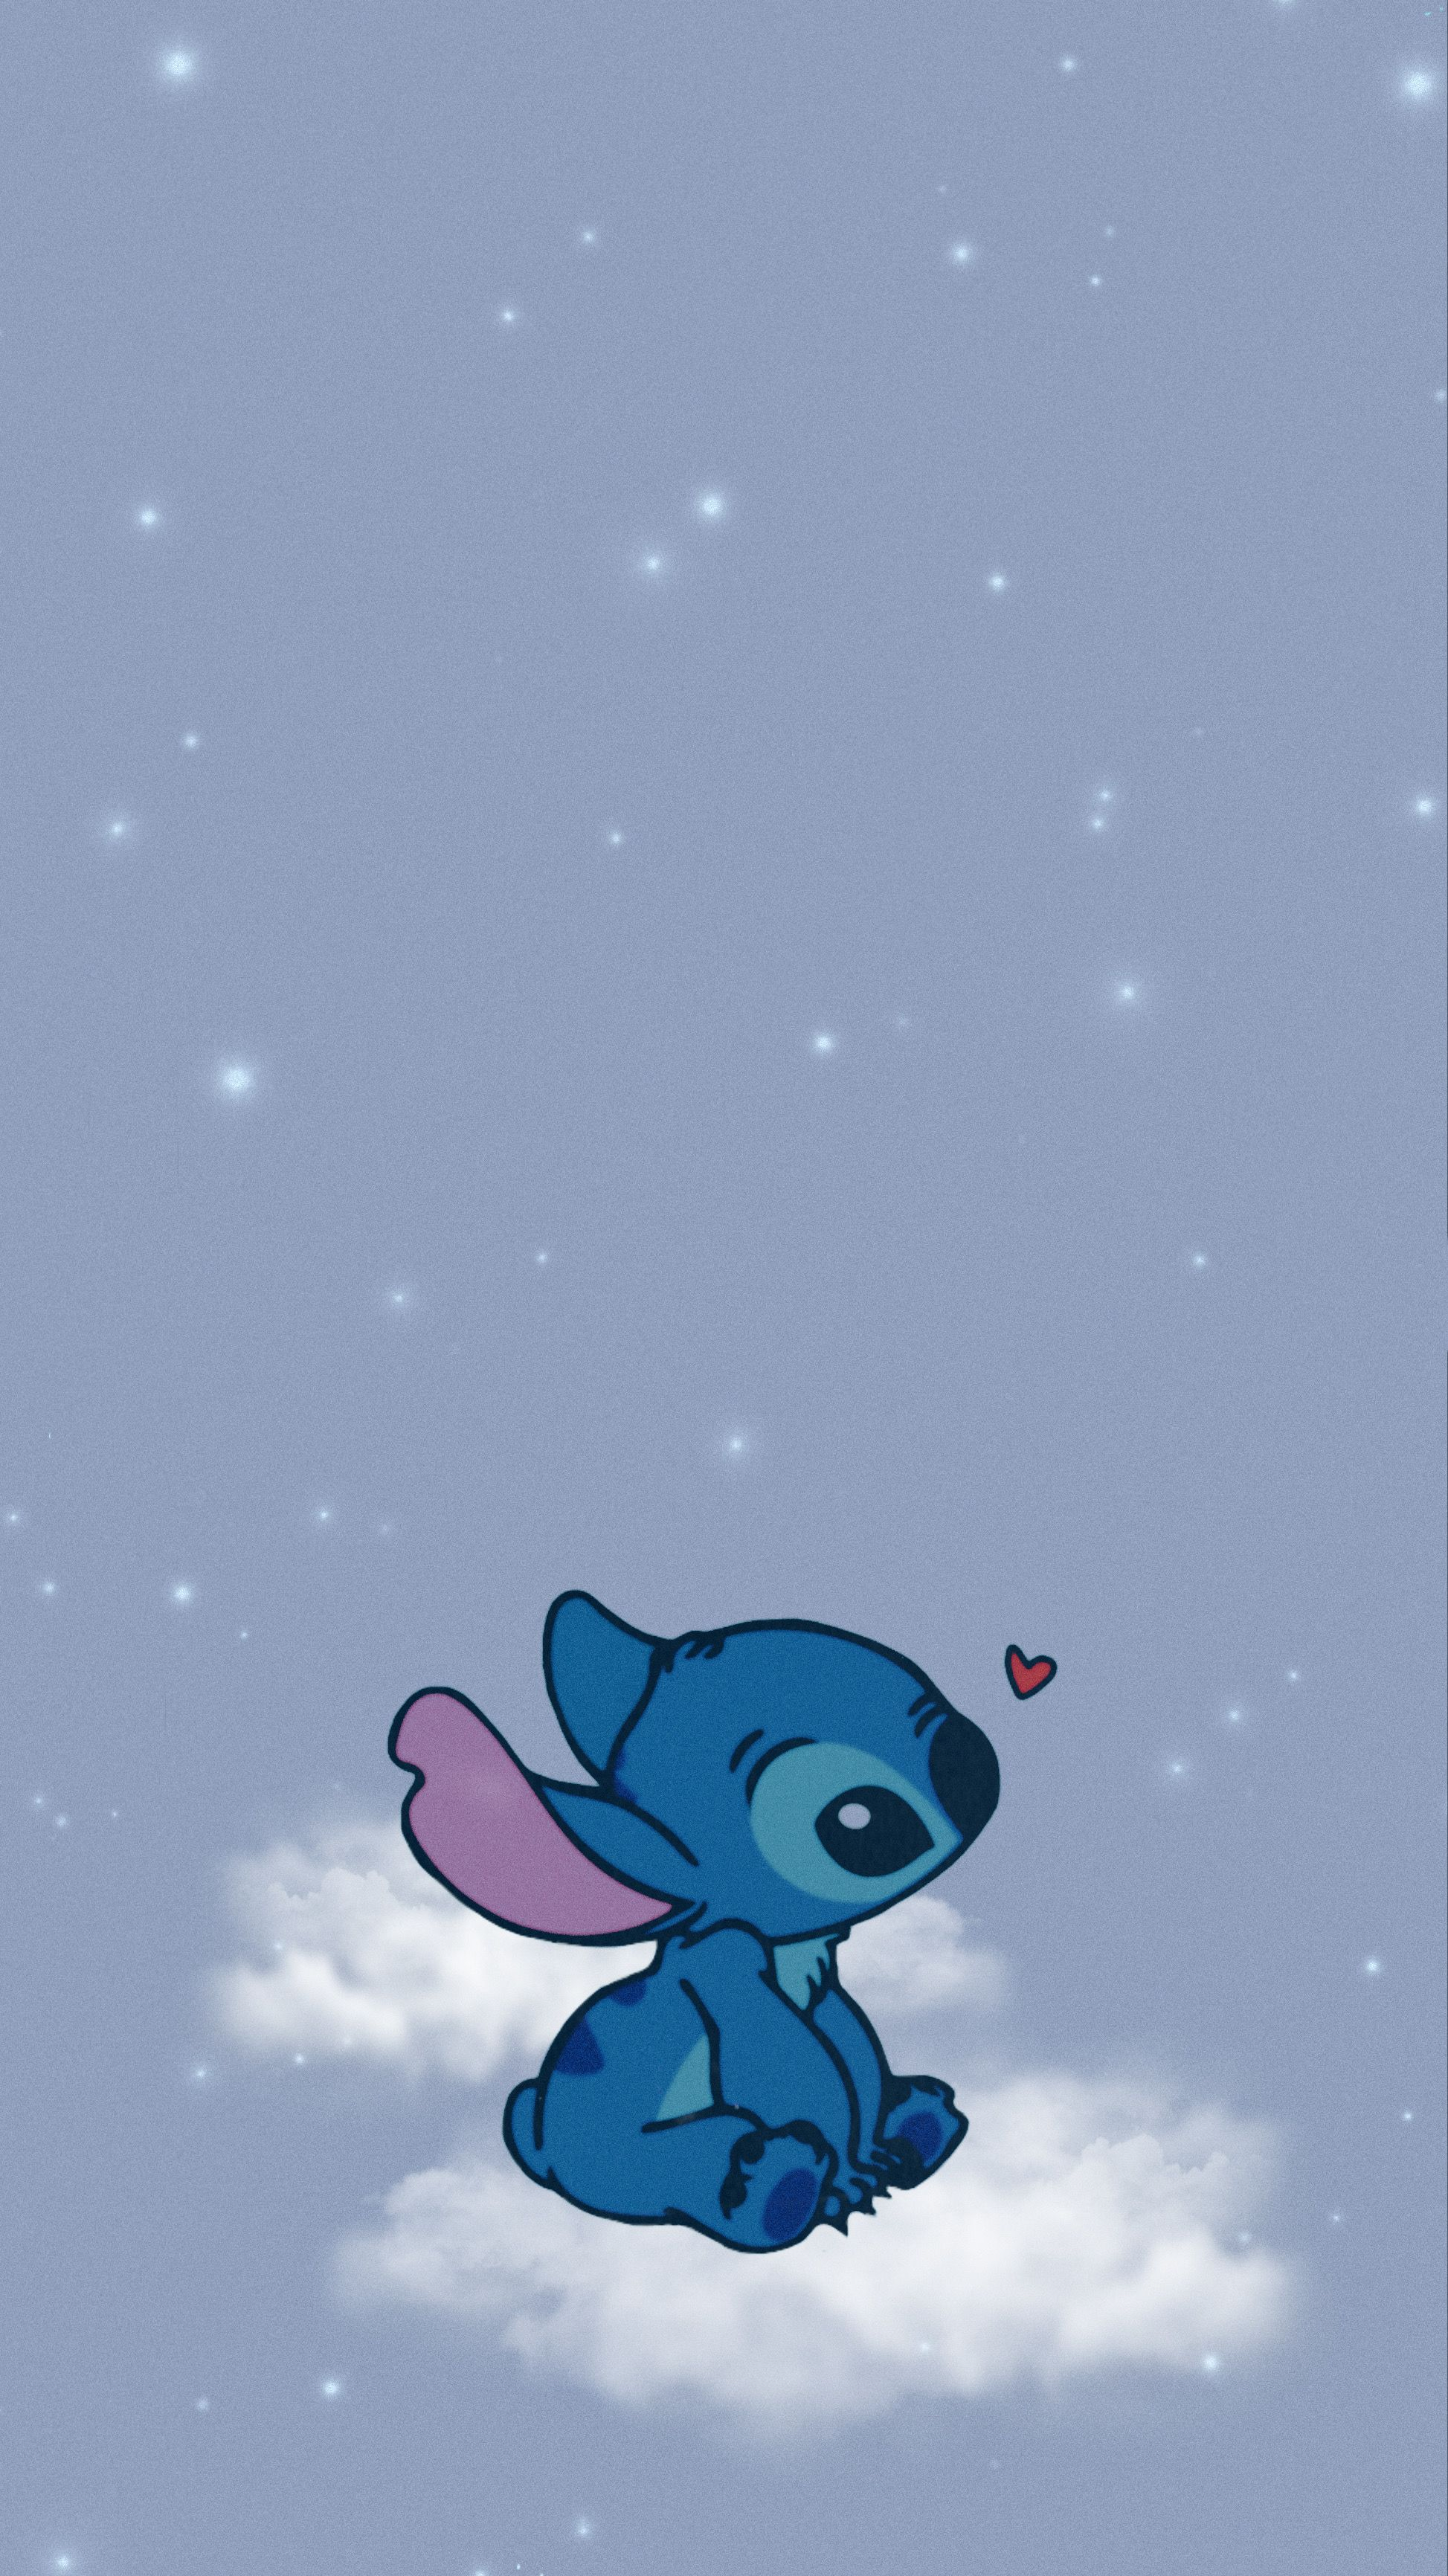 💙 #stich #clouds #sky #pretty #cute #cartoon #stichwallpaper #wallpaper #aesthetic #aestheticwallpaper #childhood #cutewallpaper #sparkle #glittery #papicks #picoftheday #ily #stayinspired #wallpaperedit #blue #lightblue #stars #ohana #heart #sweet #freetoedit